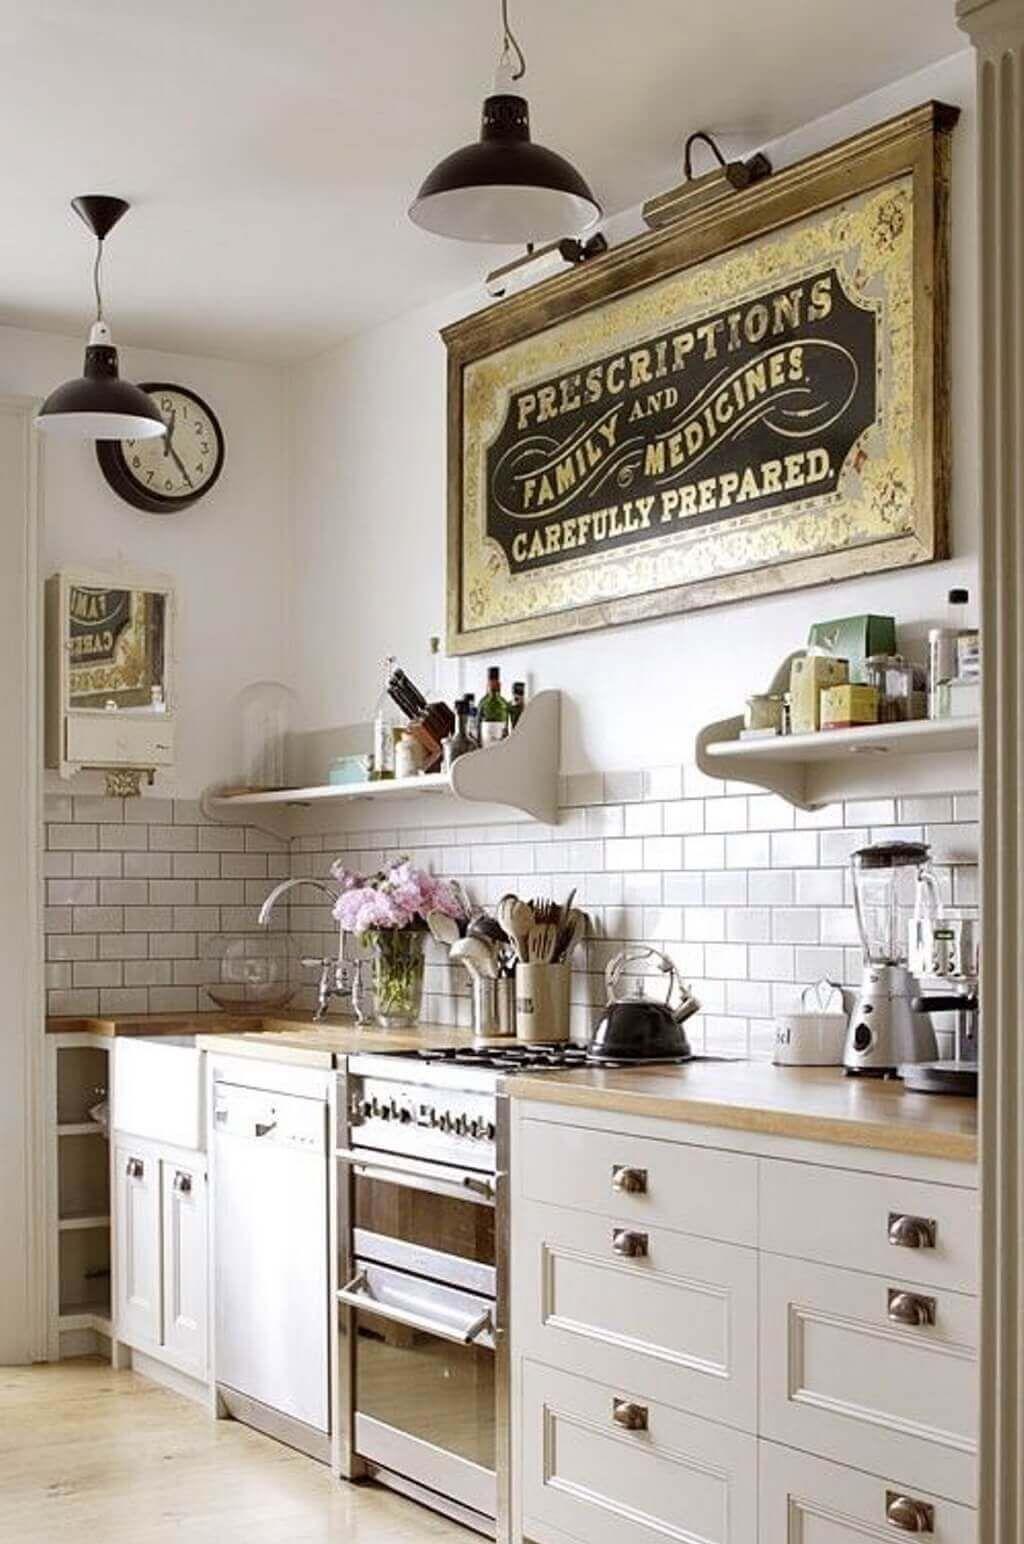 40 Trendy Vintage Kitchen Design And Decor Ideas 2021 Diy Kitchen Remodel Vintage Kitchen Vintage Kitchen Decor